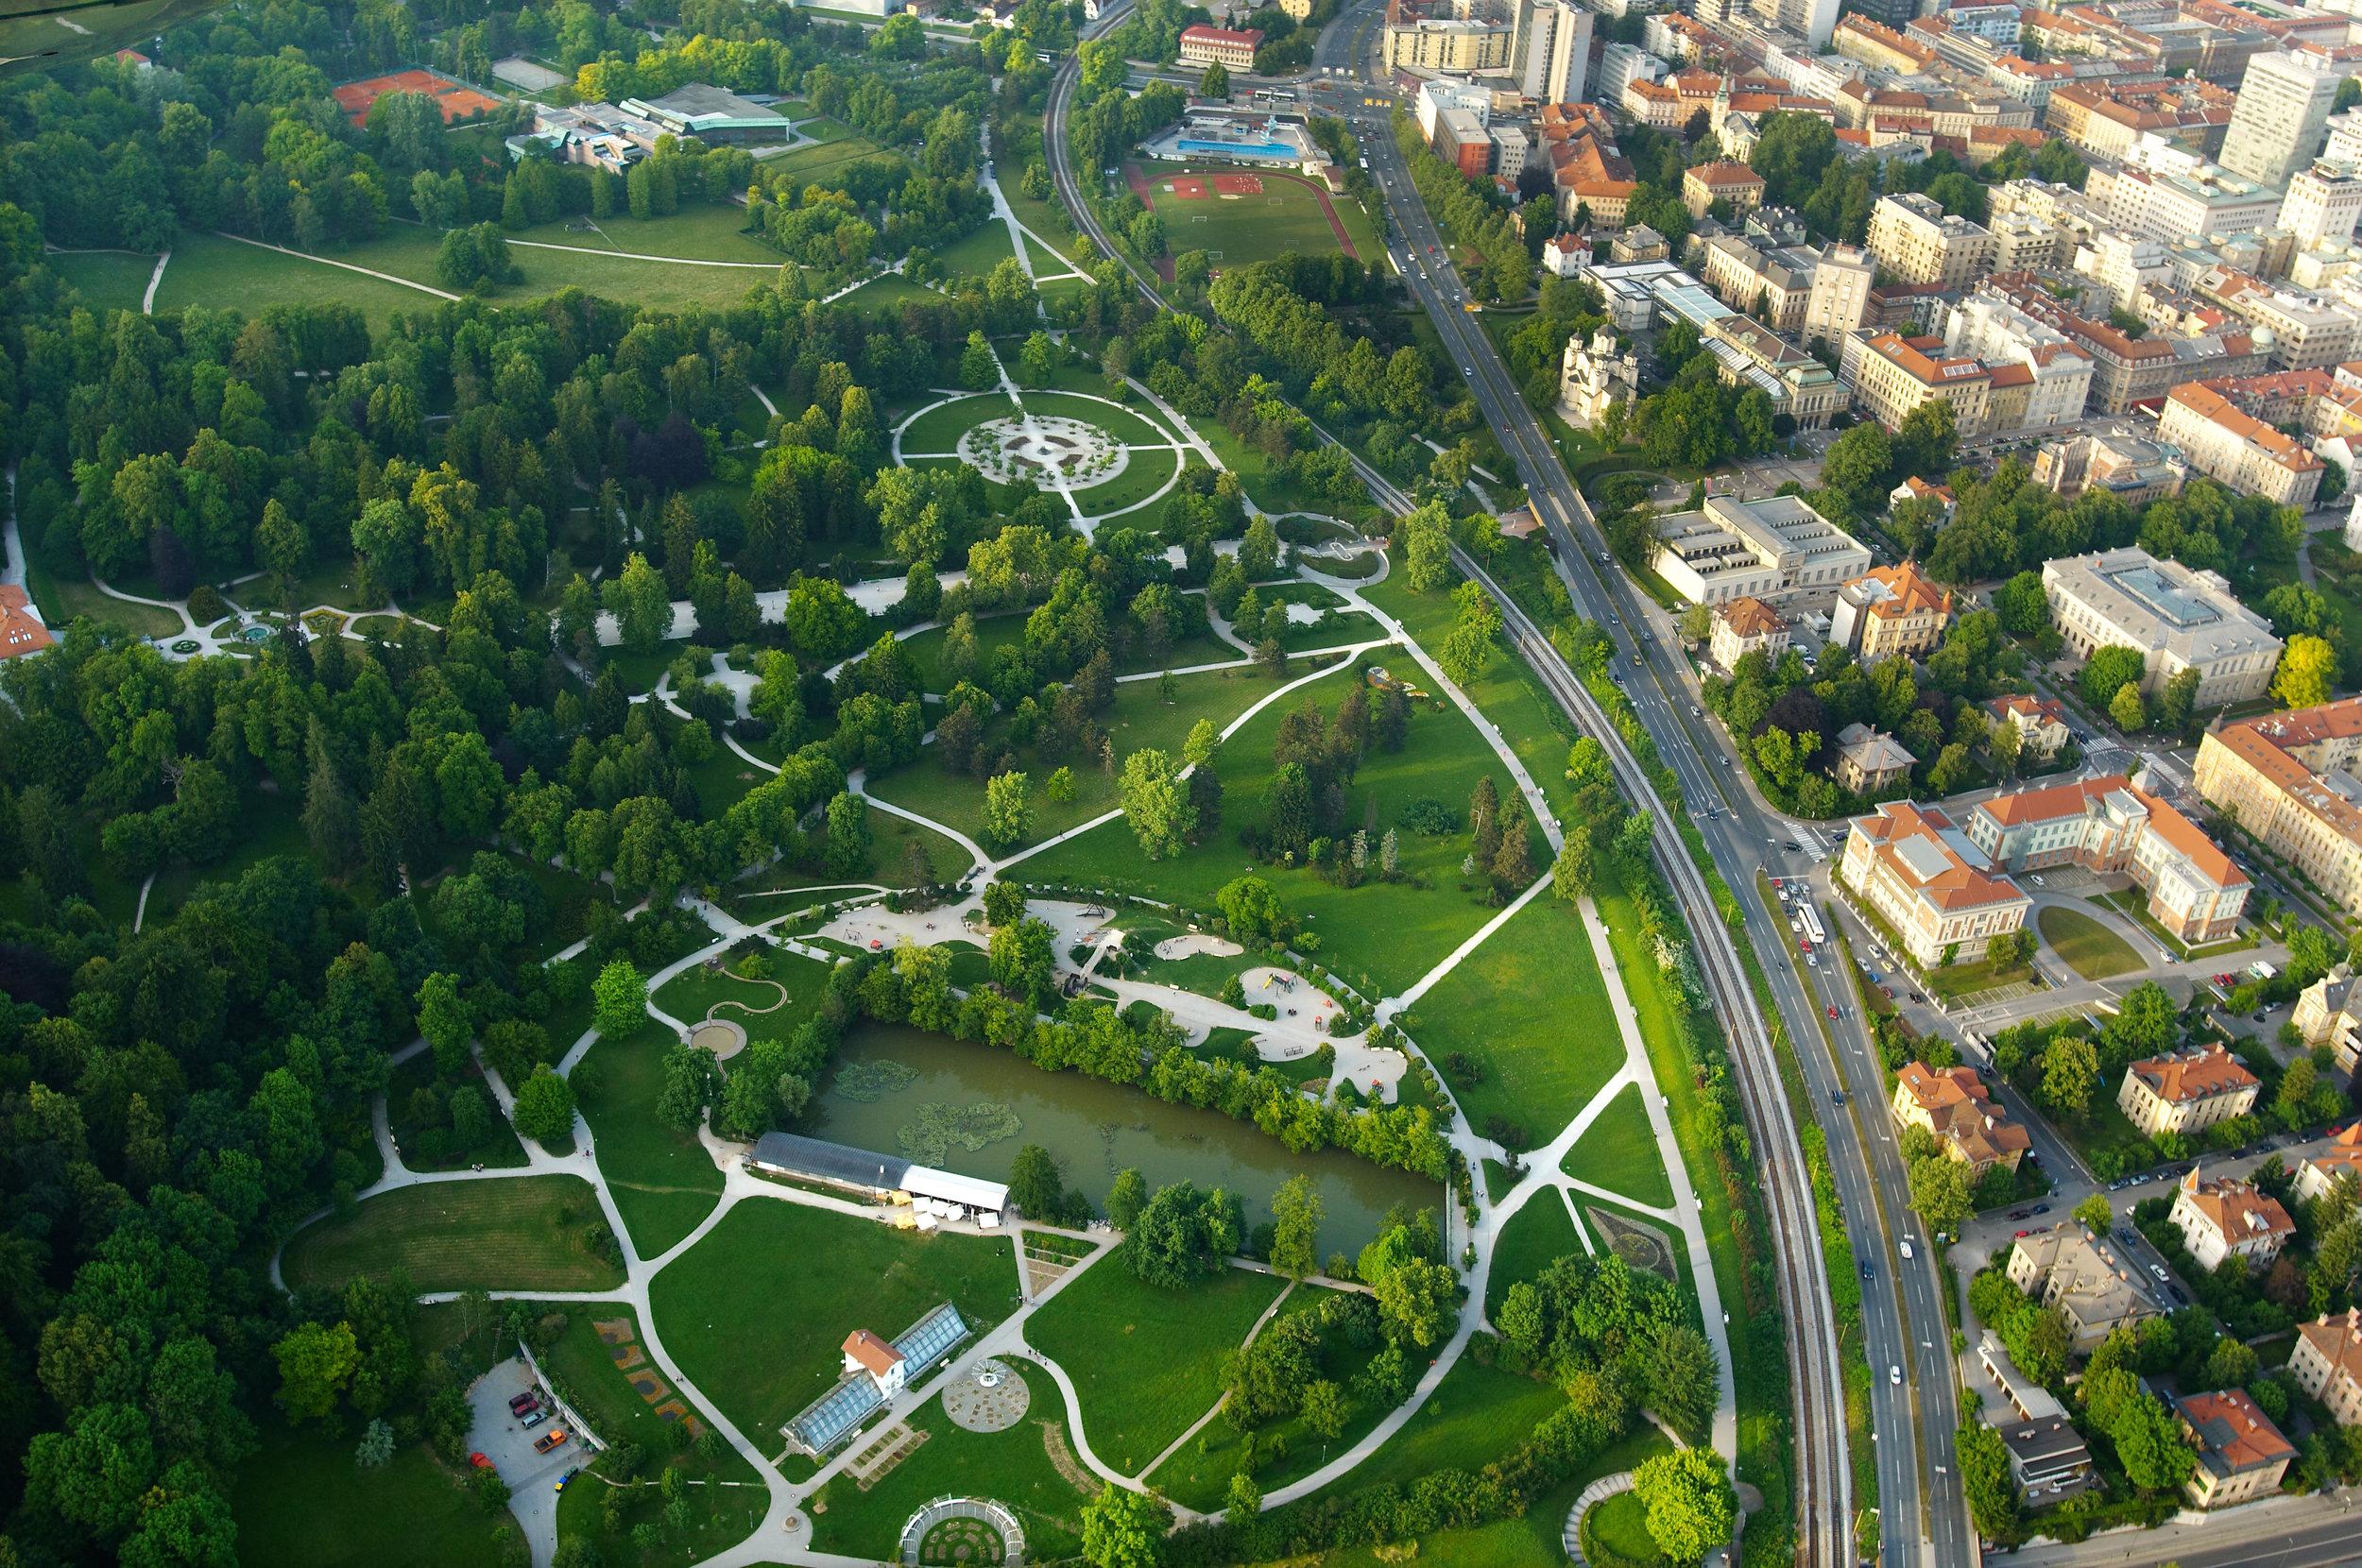 park-tivoli_tomo_jeseninik_mostphotos-arhiv-turizem-ljubljana.jpg